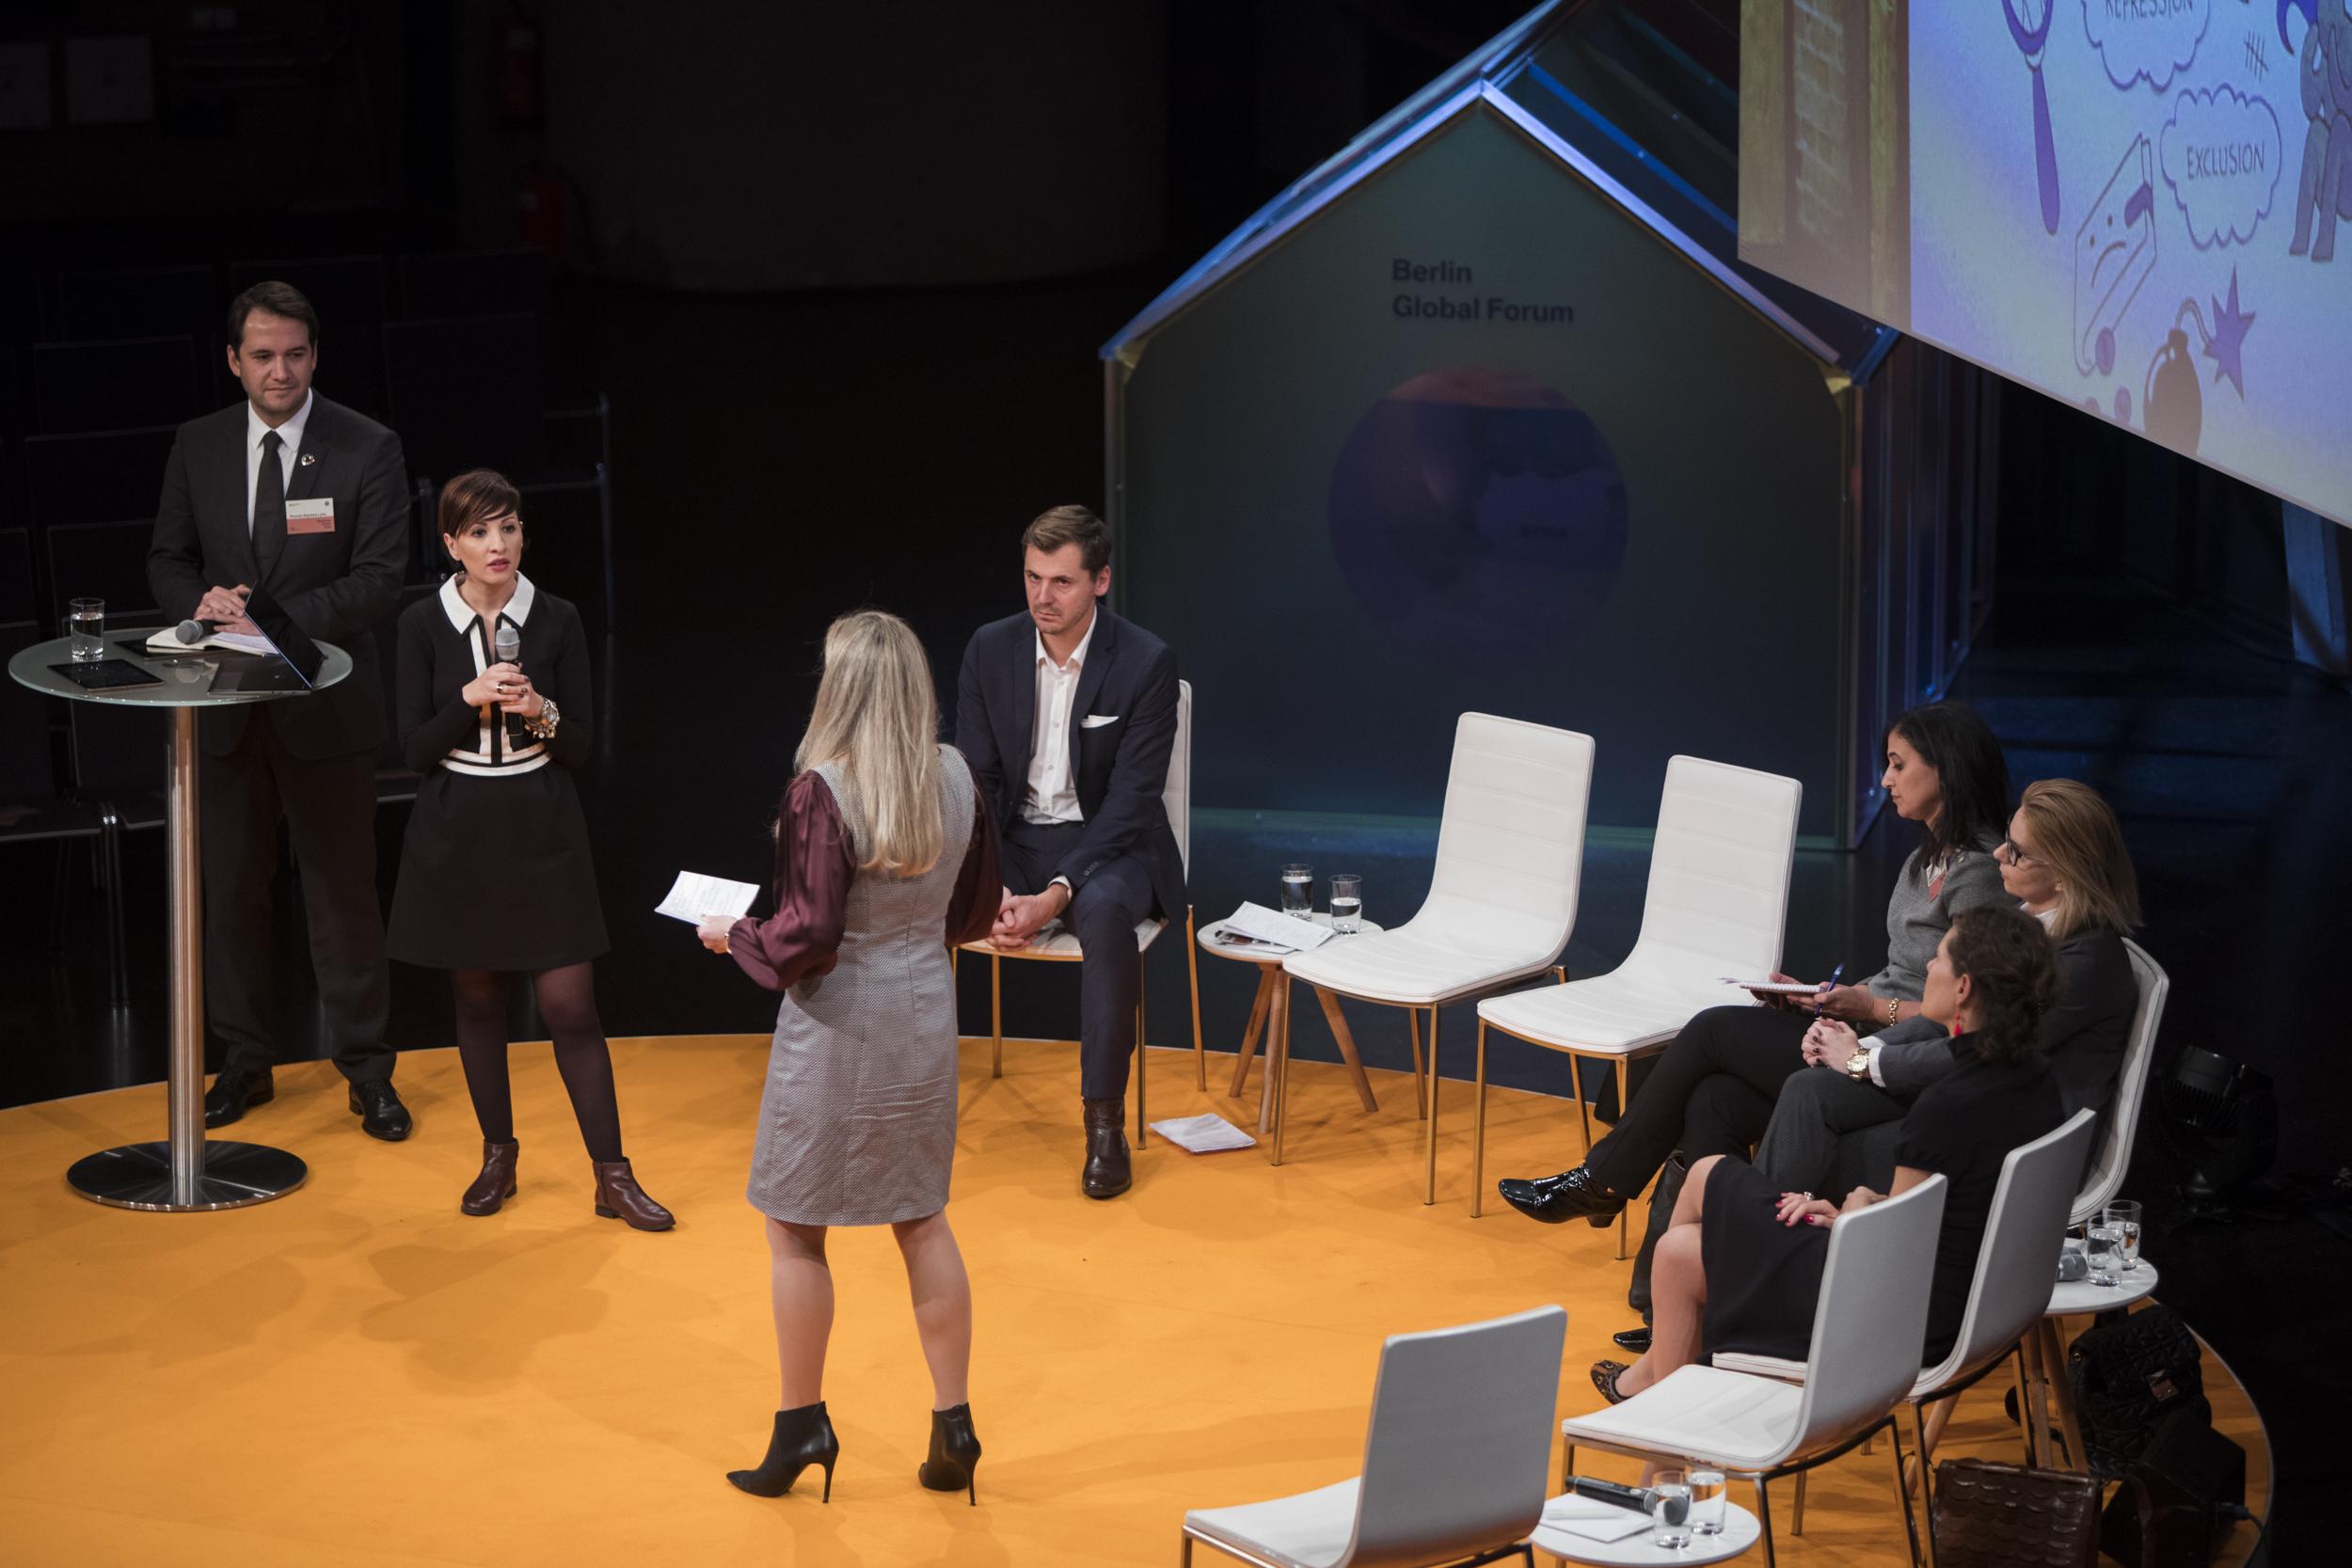 BerlinGlobalForum_17__CL_9803_Claudia Leisinger.jpg